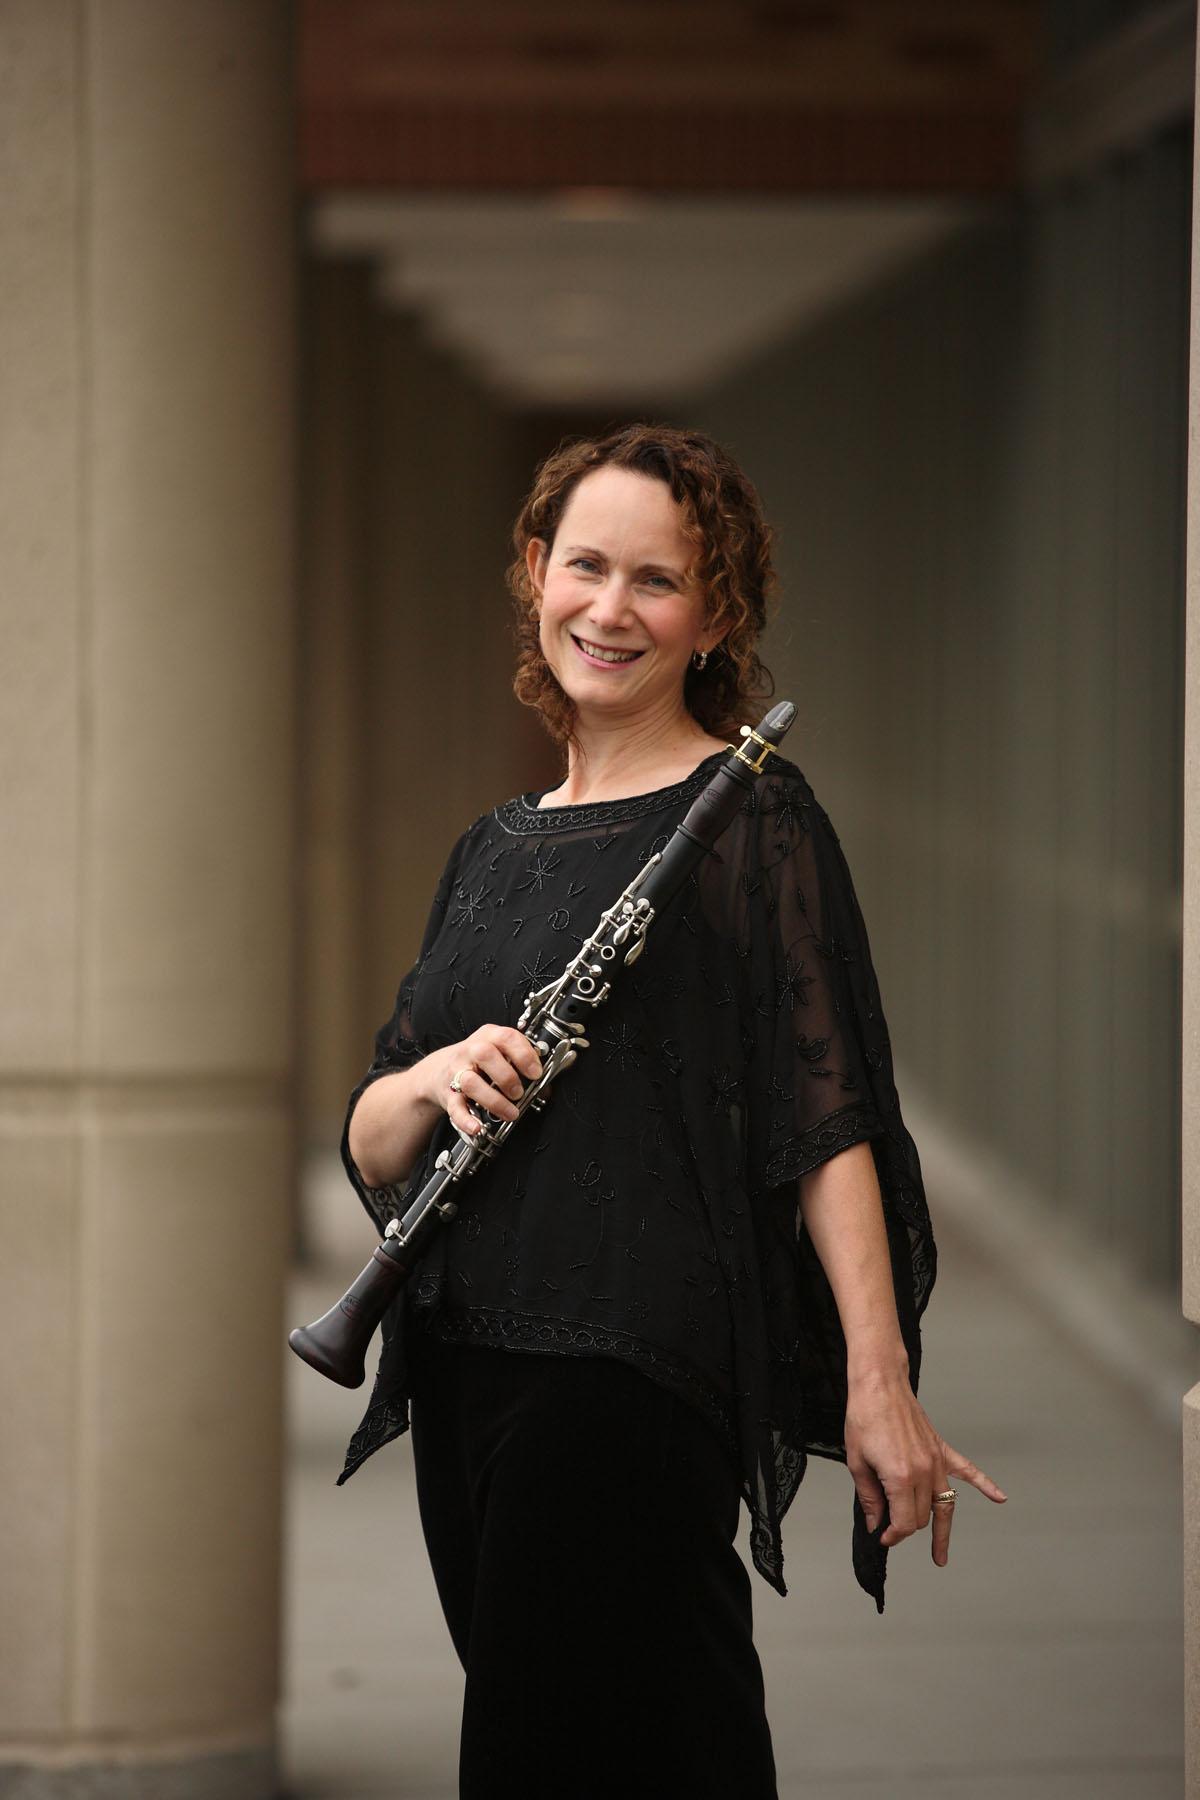 (Kathryne Pirtle, Soloist)